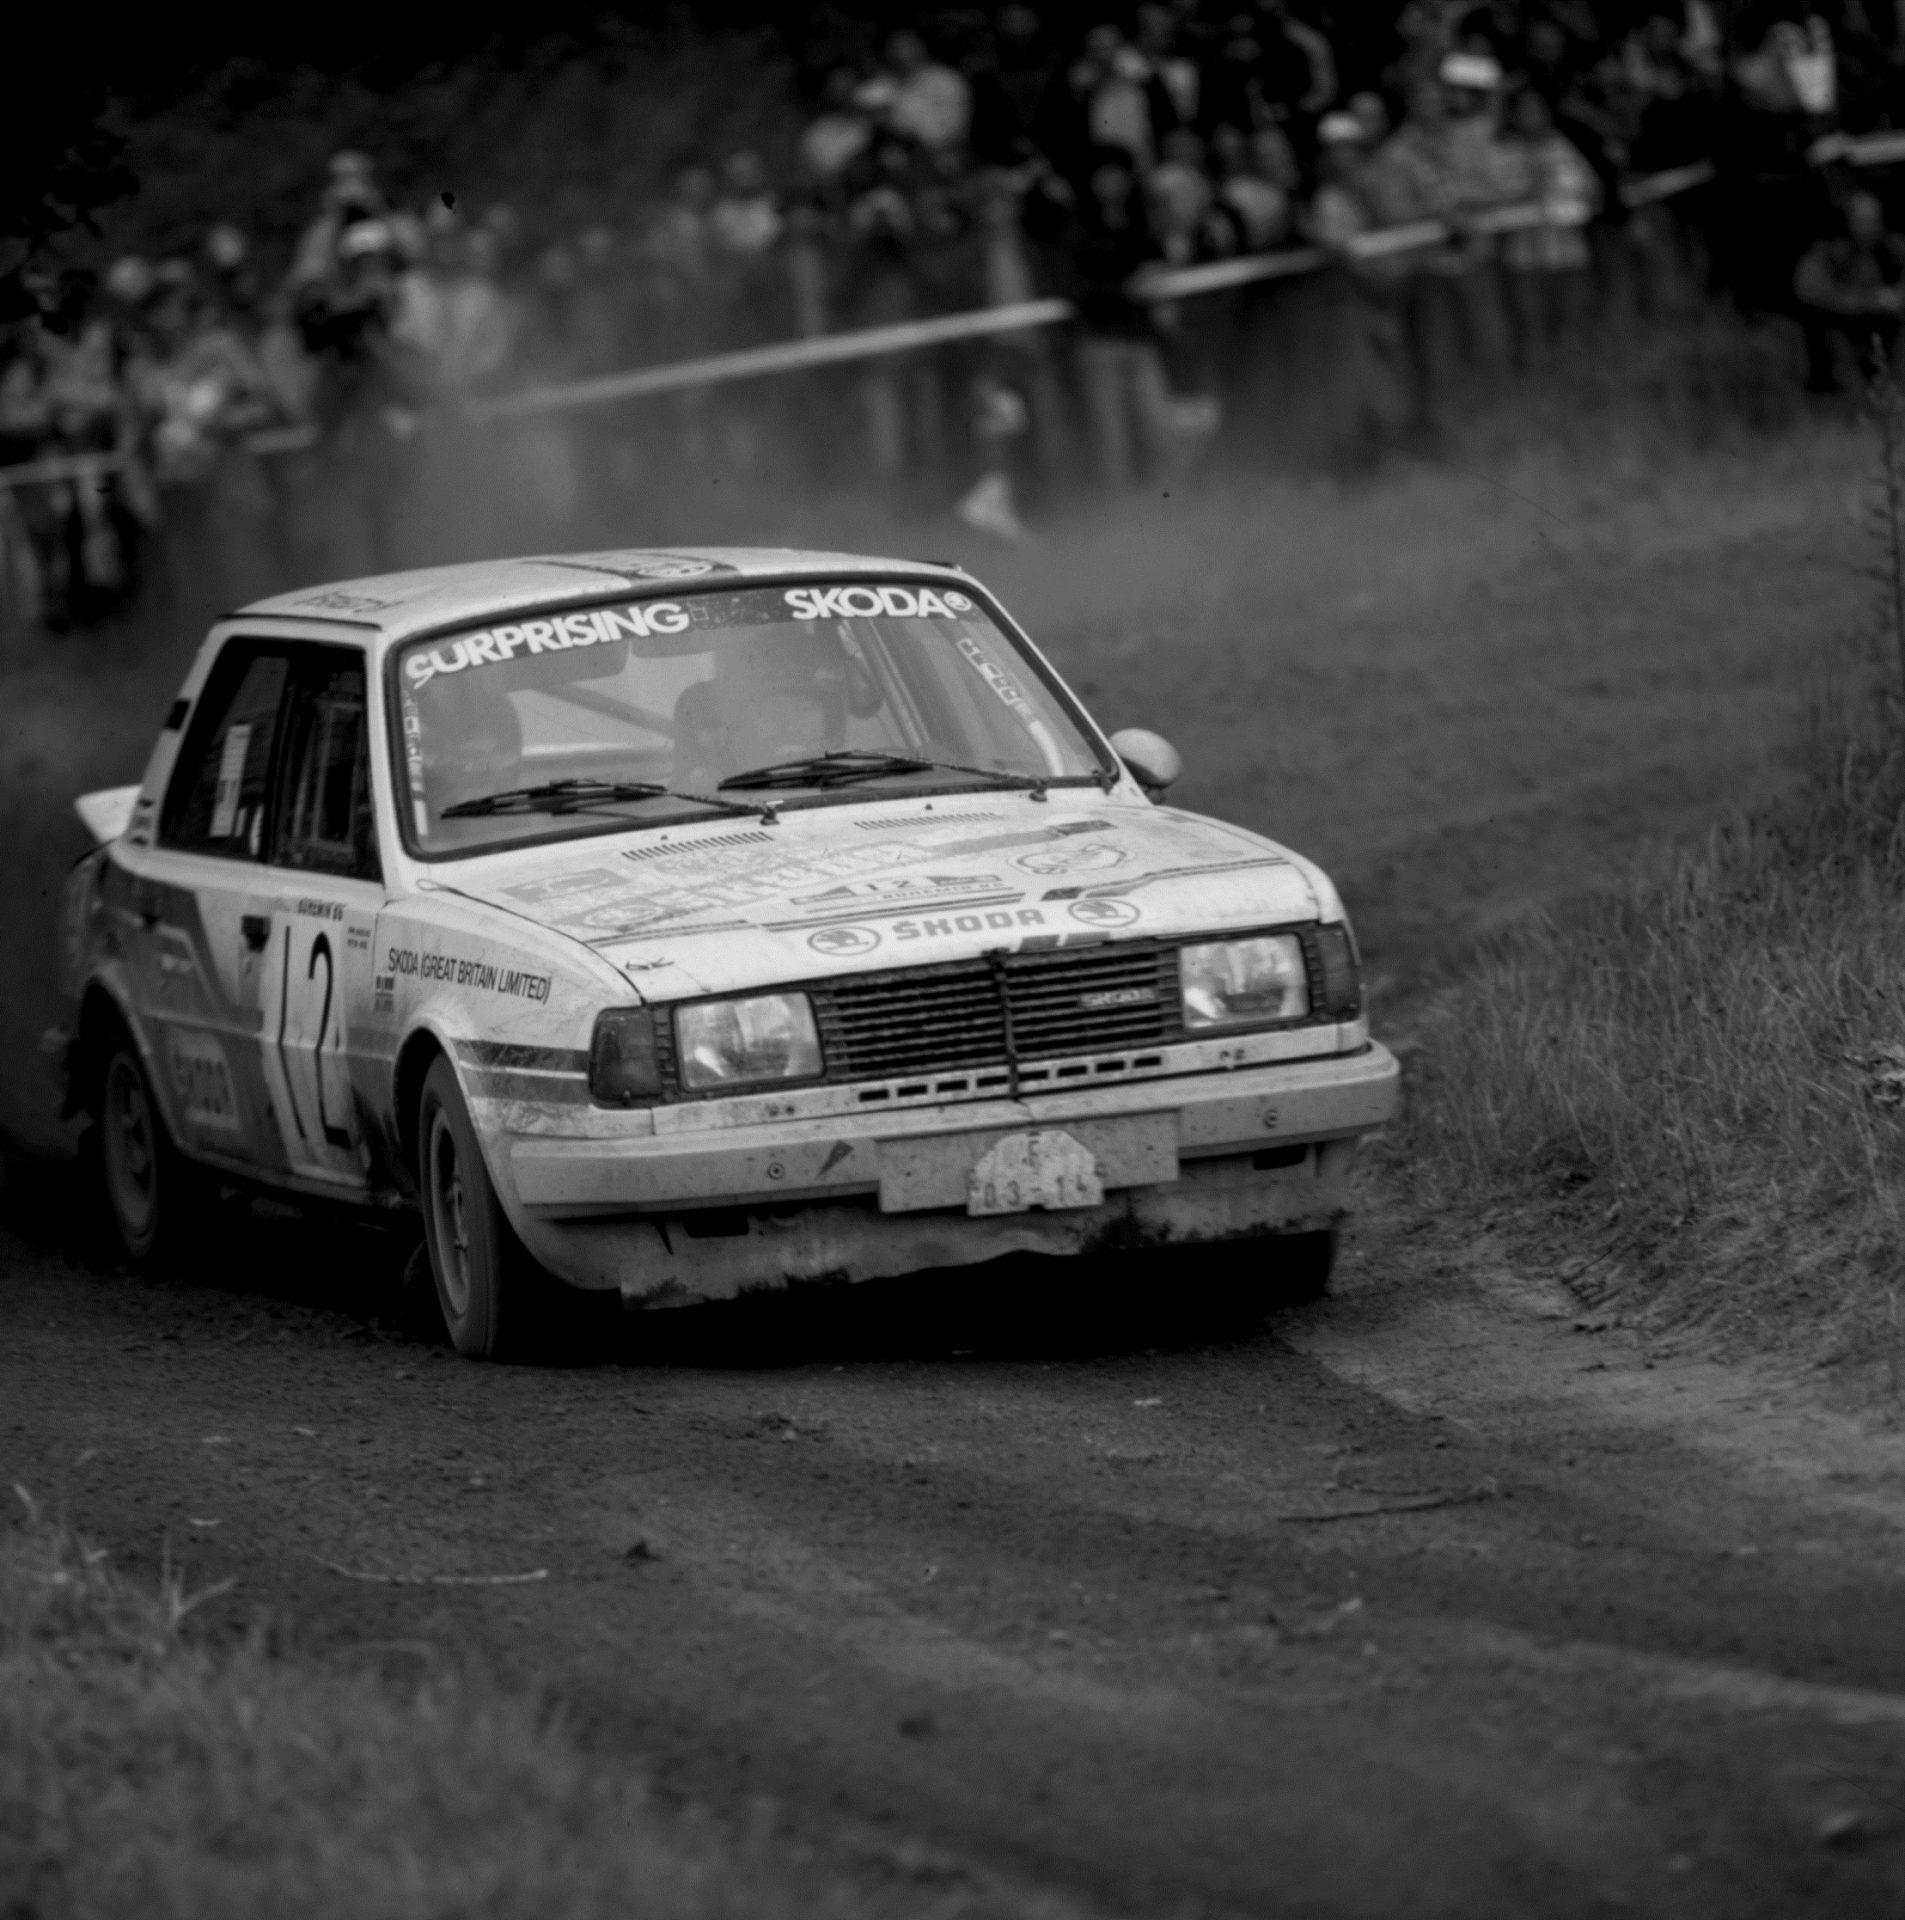 The Last of the Rear Engined Racers: Škoda 130 LR Group B Rally Car